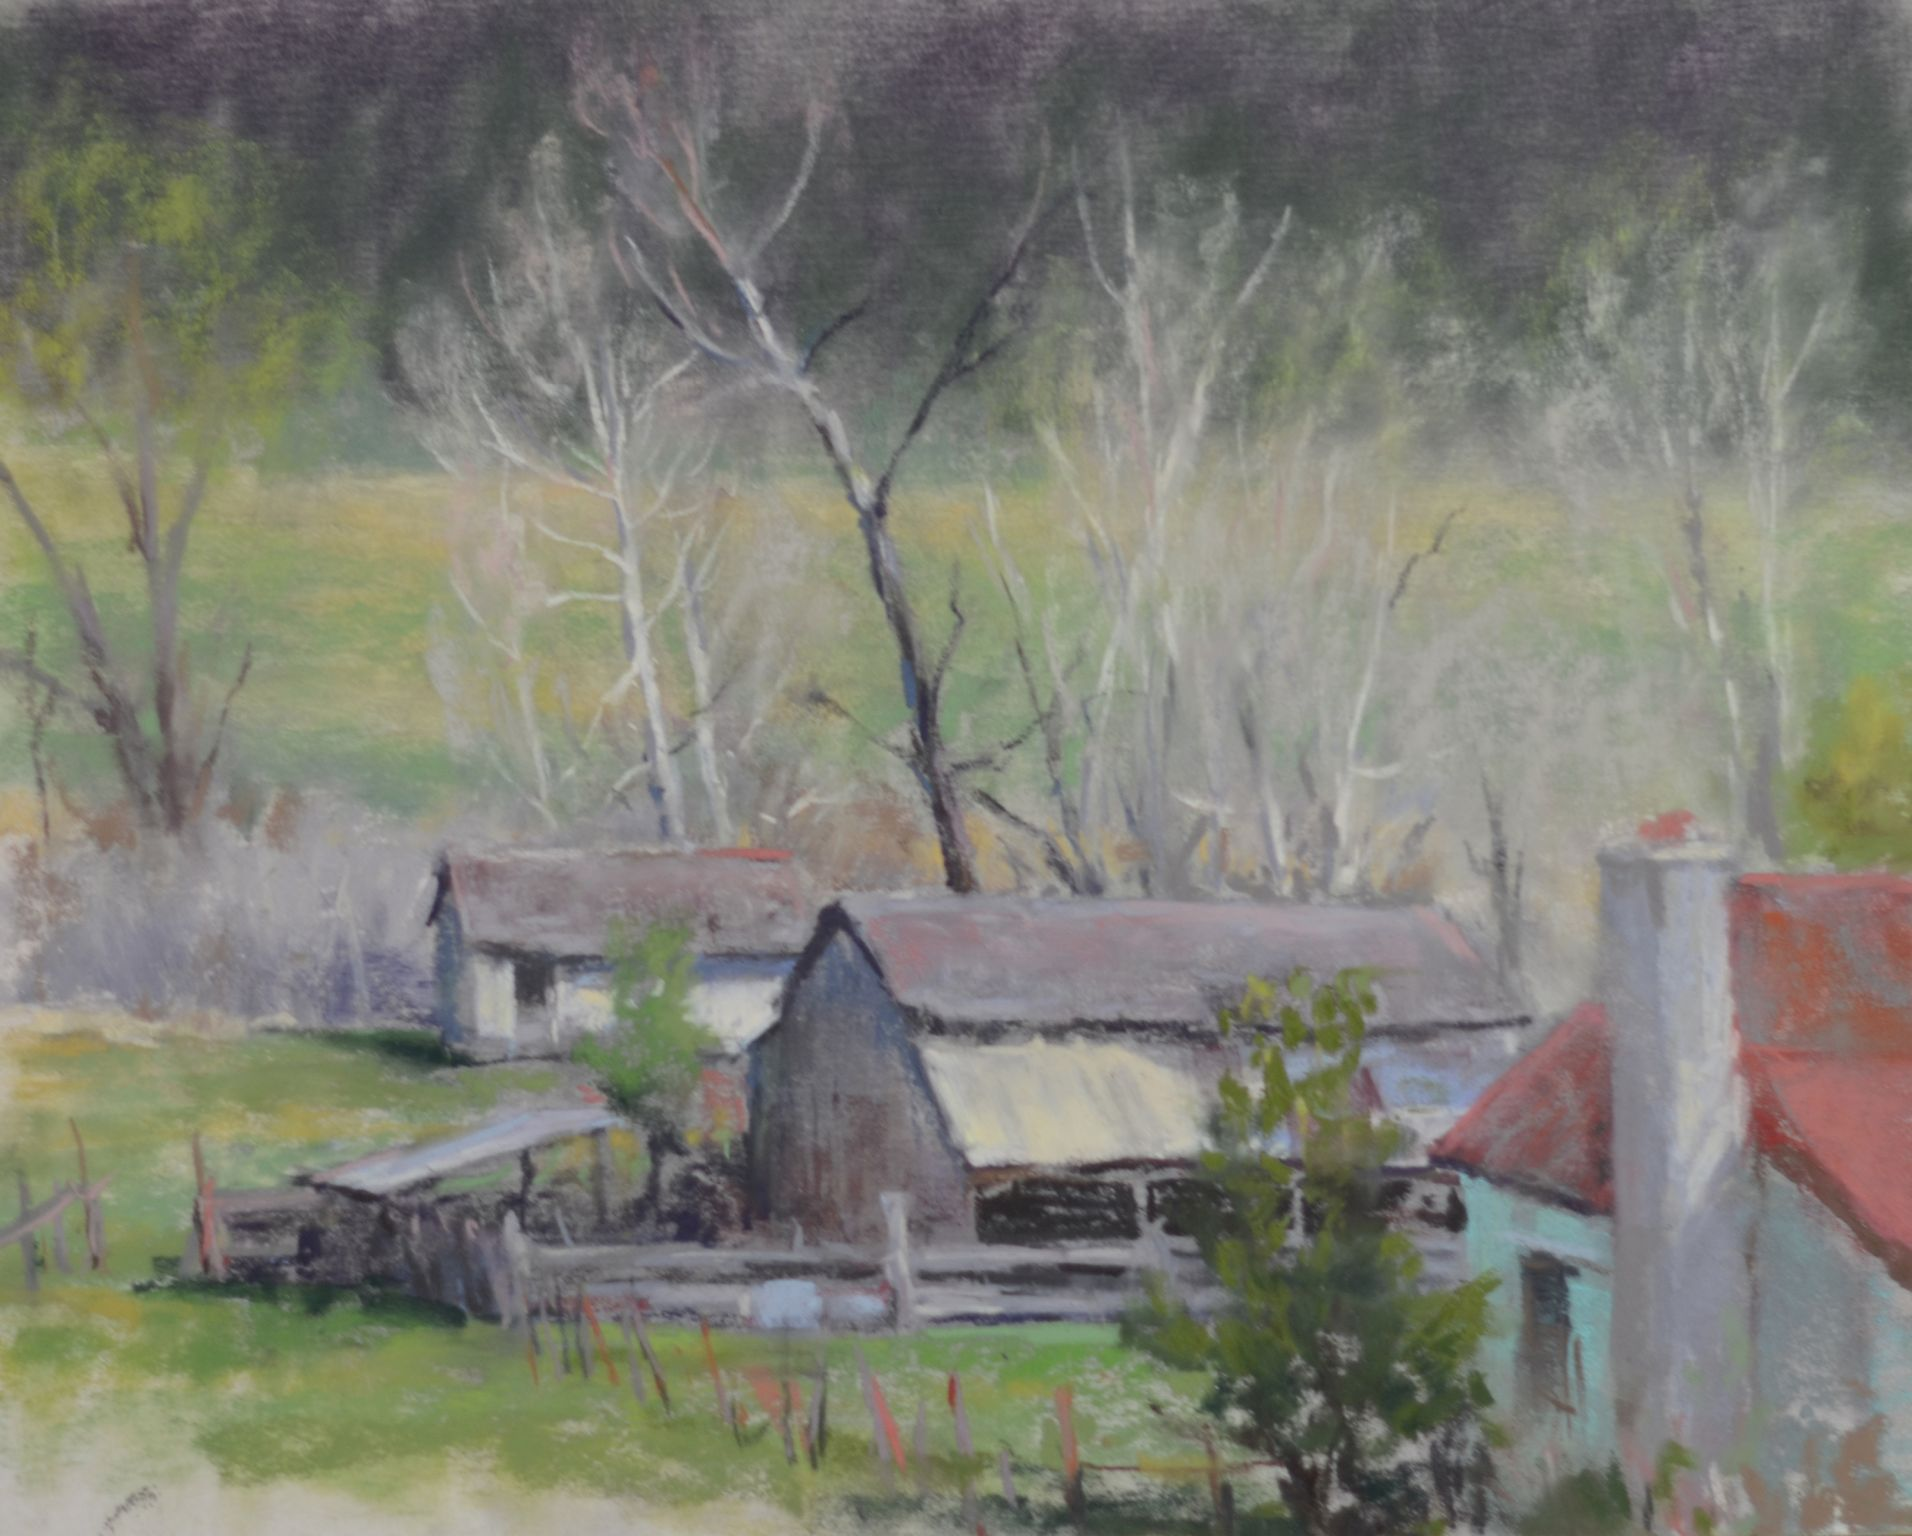 Long Valley Farm